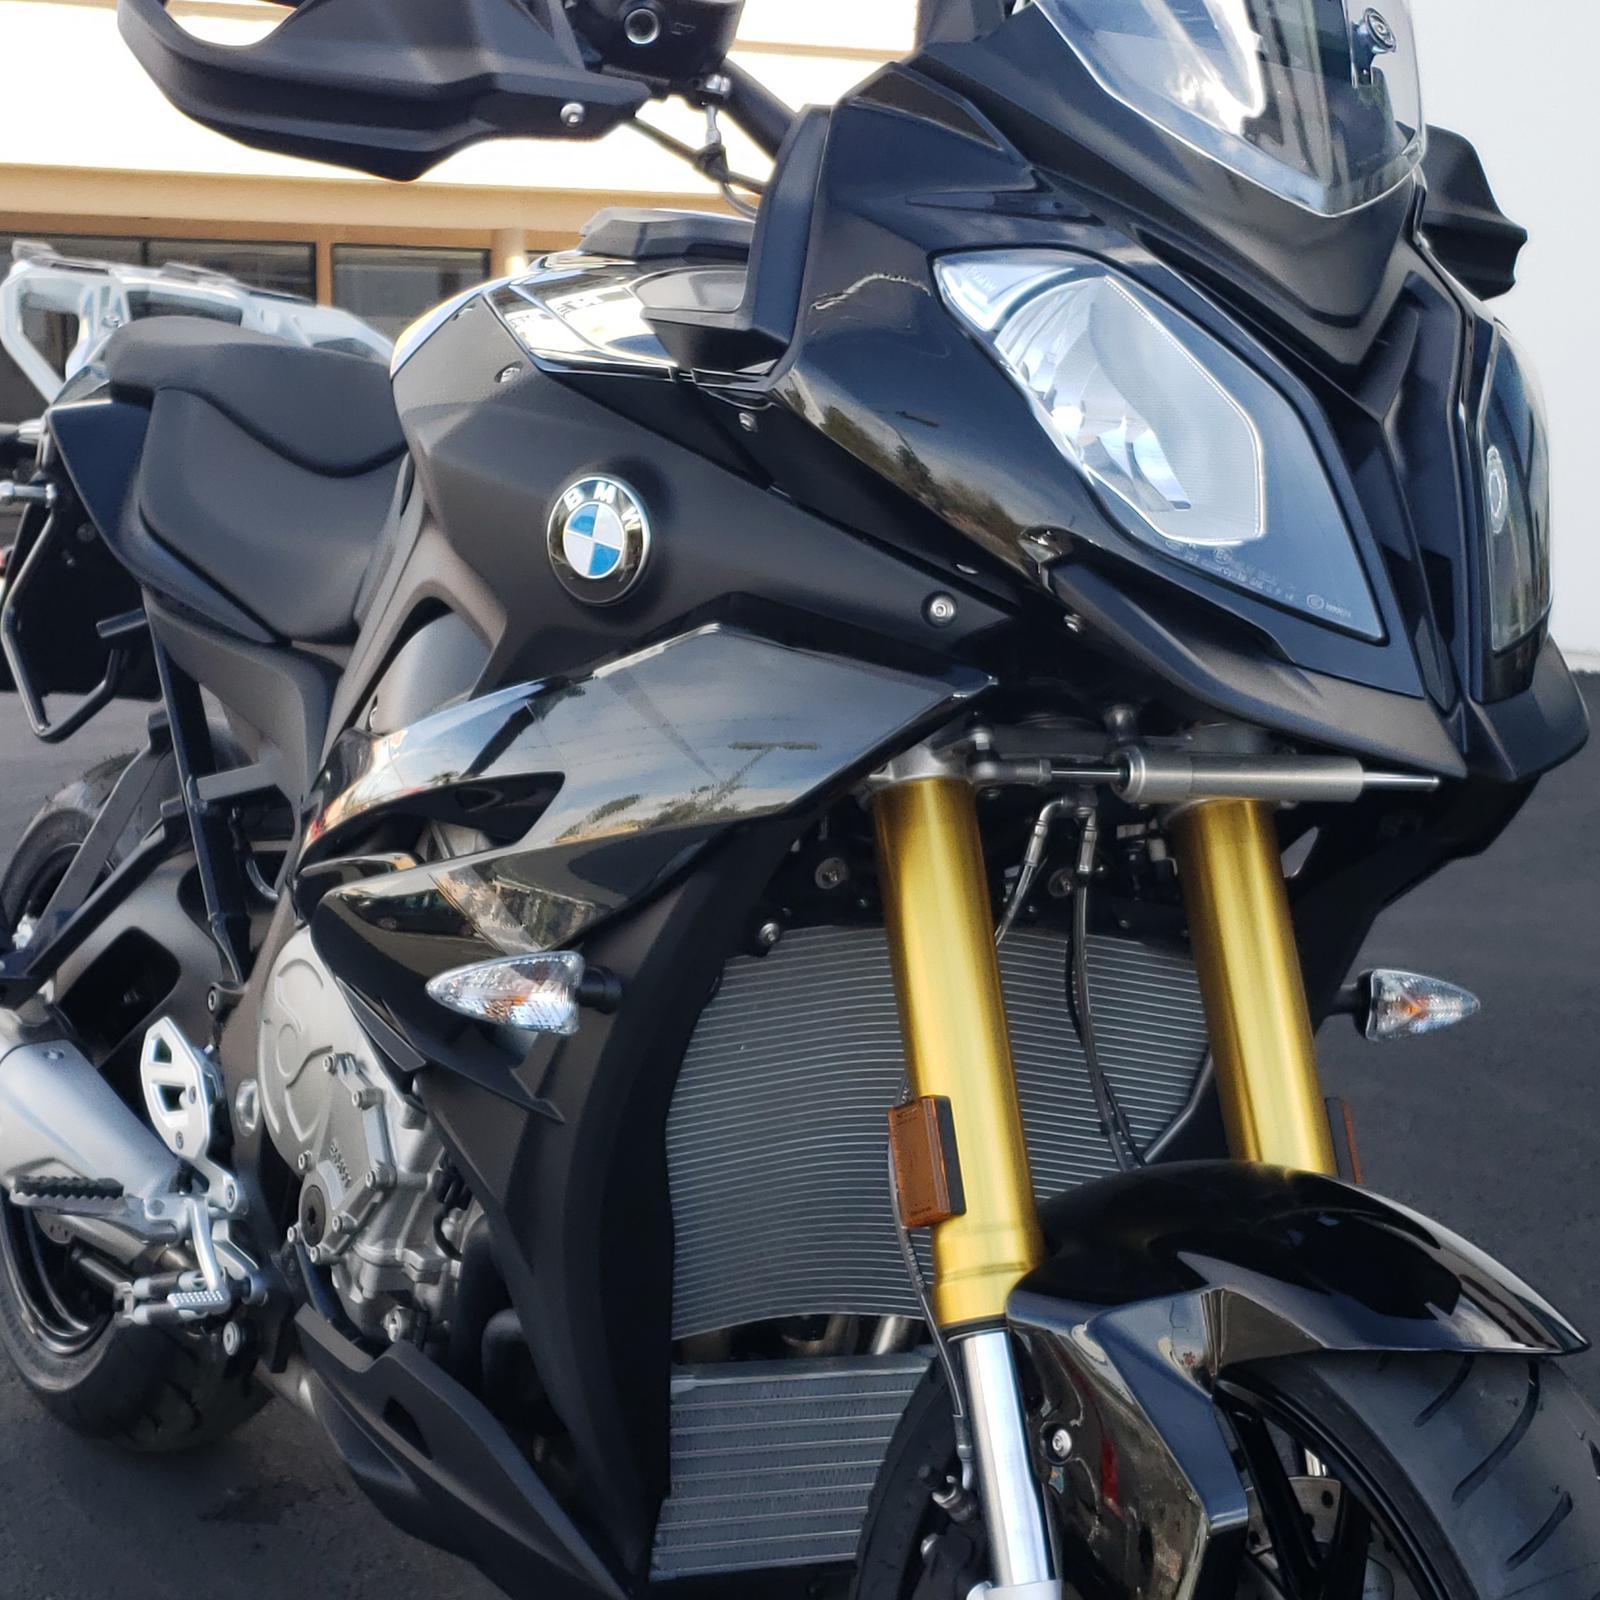 2019 Bmw S 1000 Xr Triple Black For Sale In Las Vegas Nv Freedom